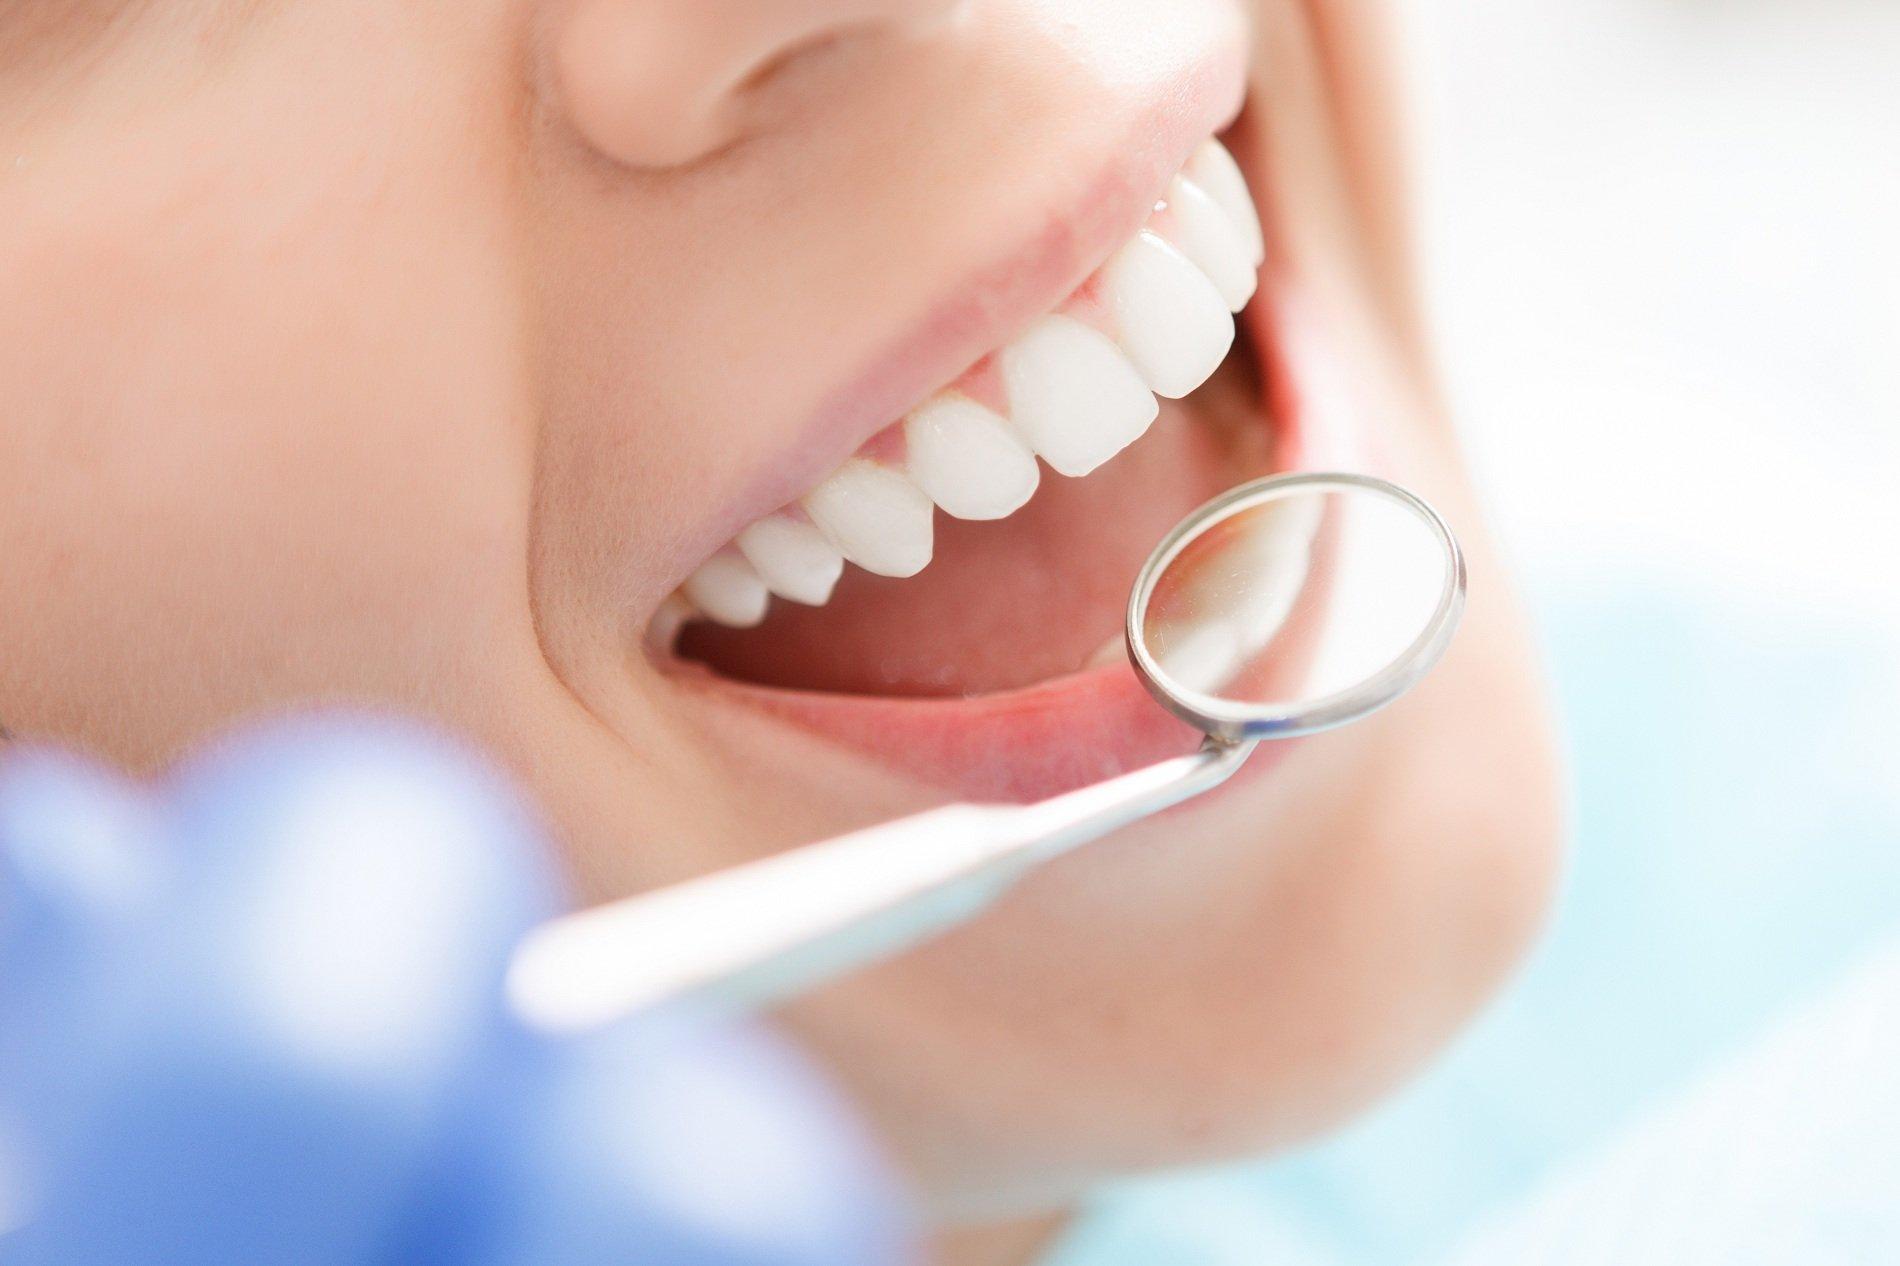 dentista osserva i denti di una paziente